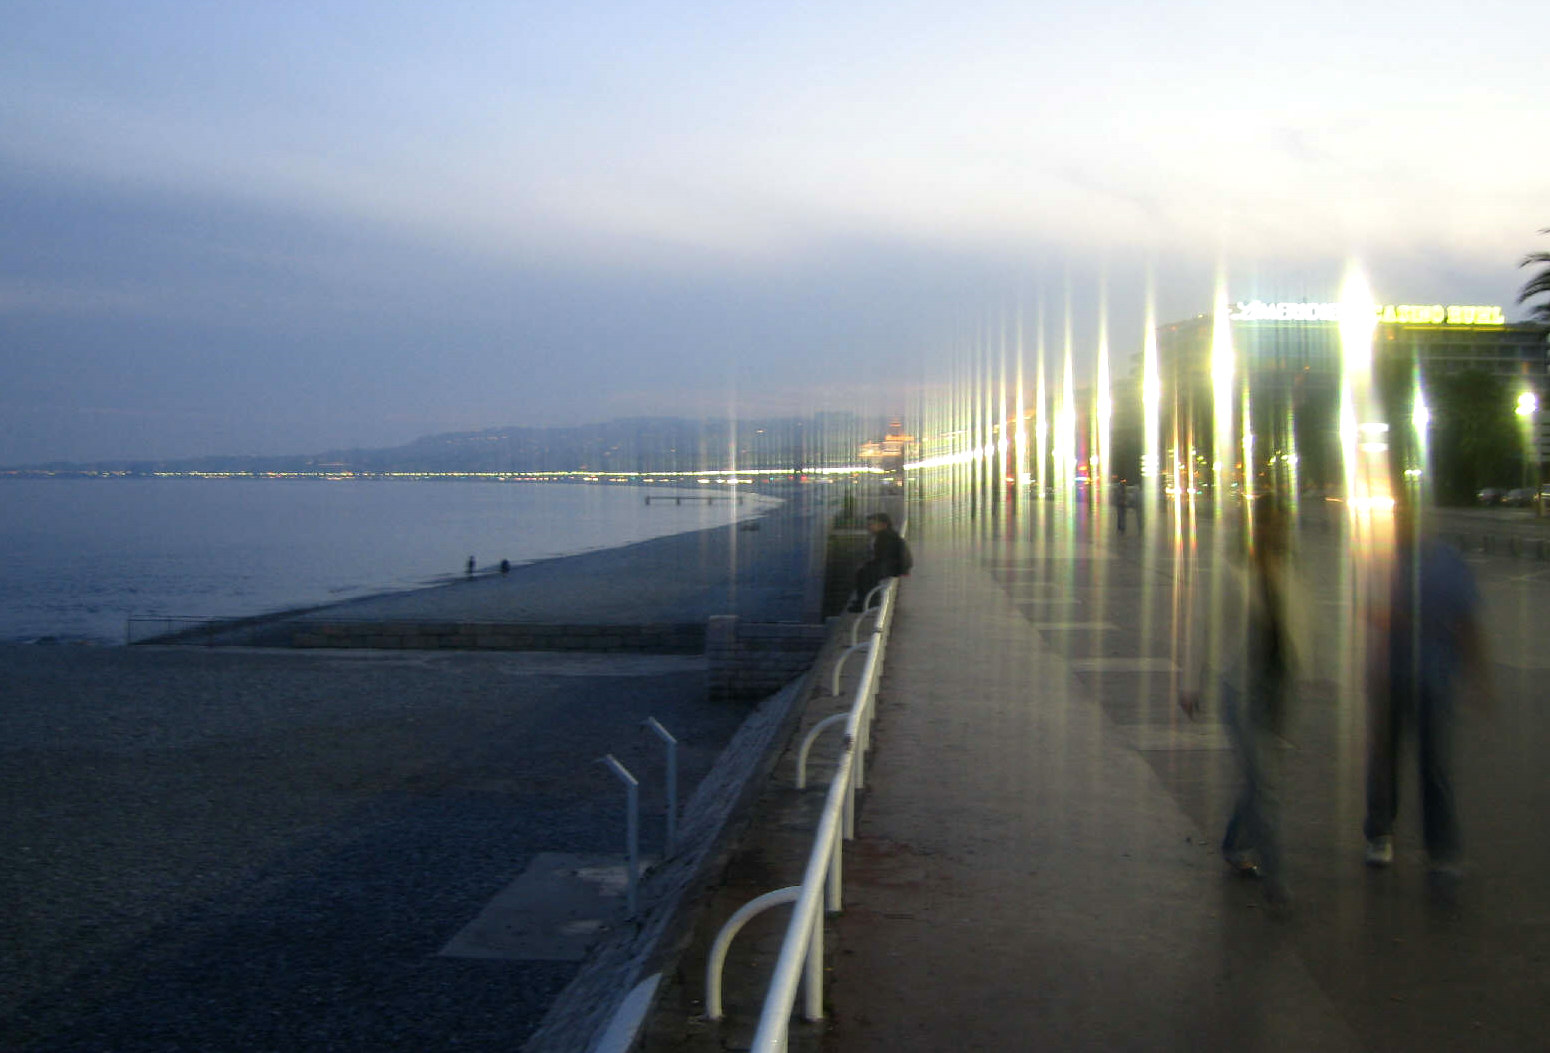 Nizza, Promenade des Anglais, aufgenommen mit Canon Powershot S40 + Pizzafilter